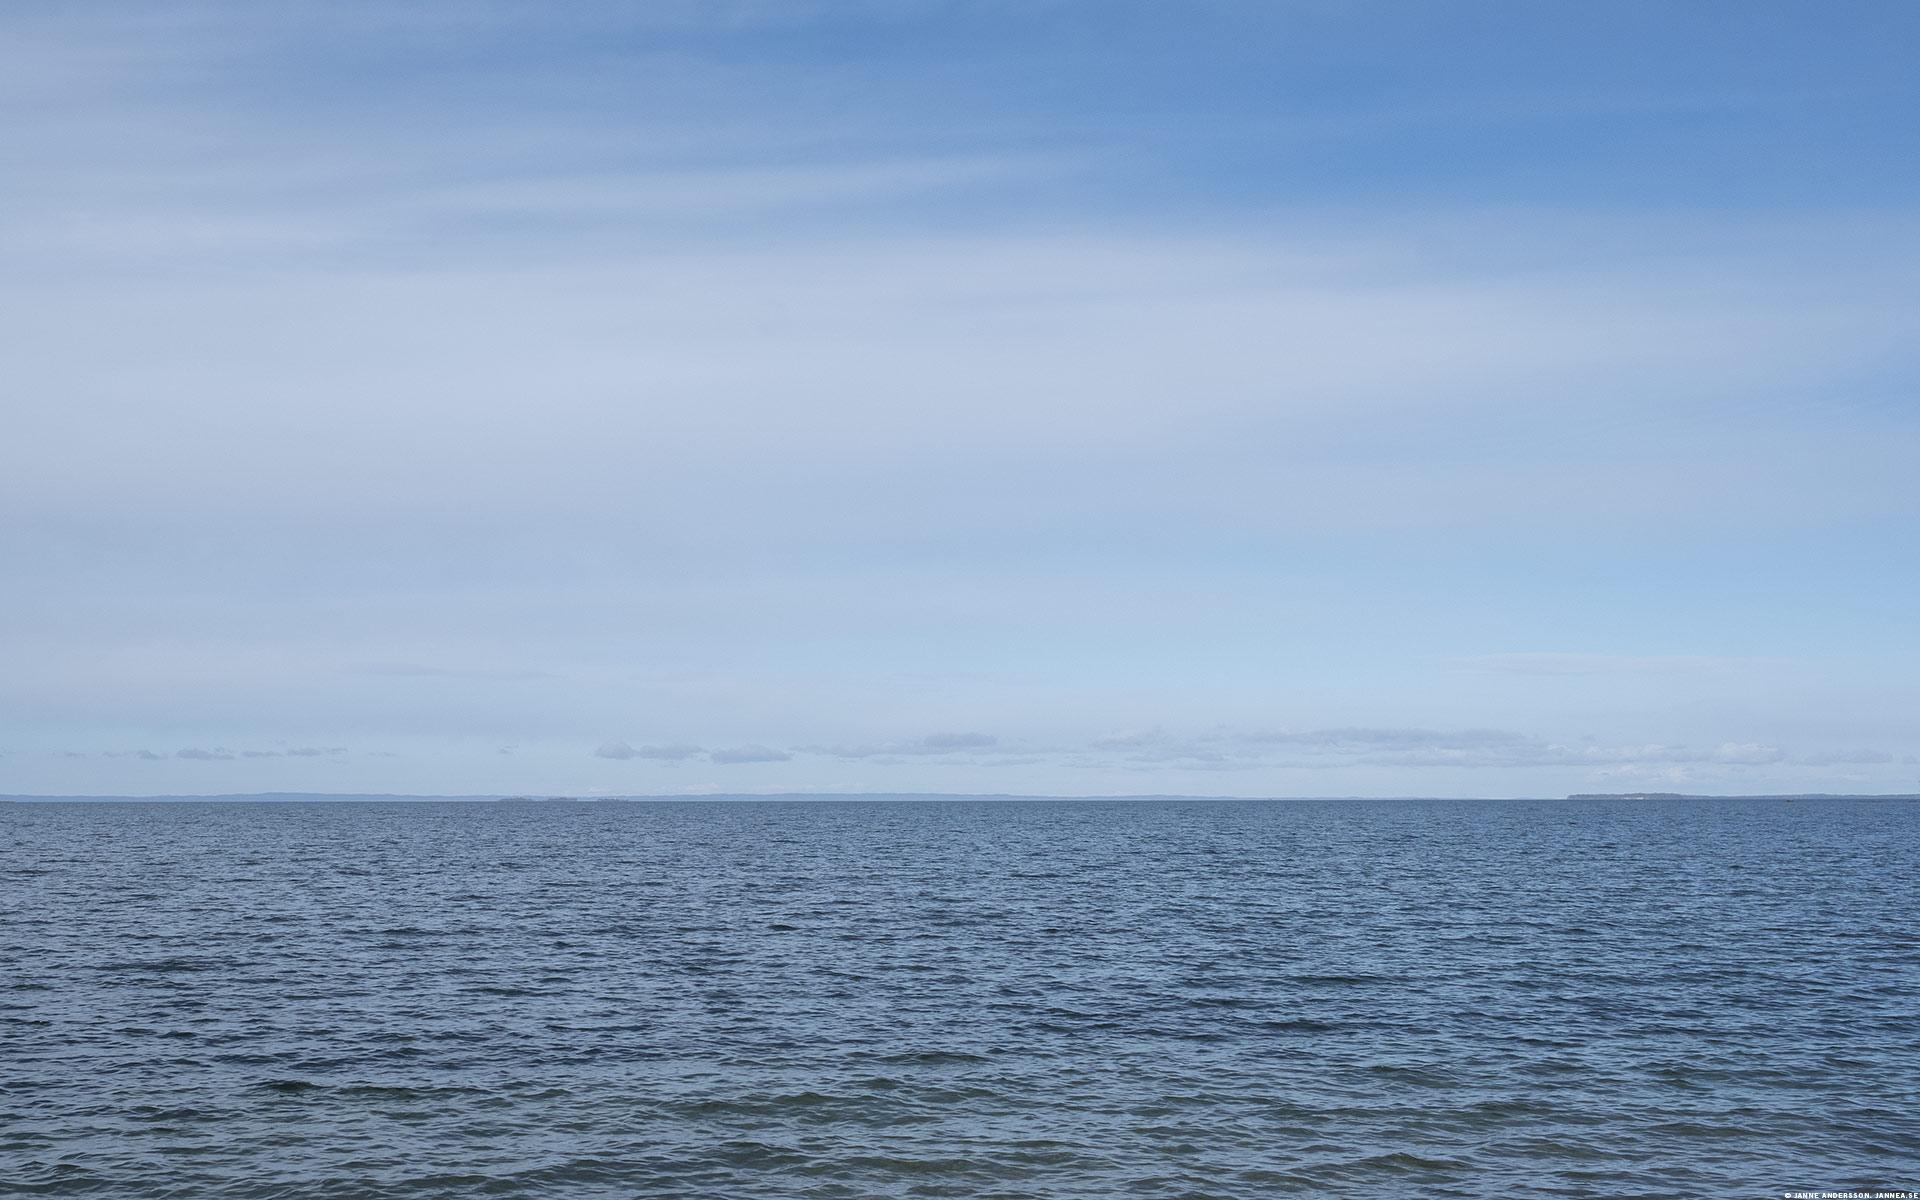 Vättern – en blå sjö och en blå himmel |© Janne A